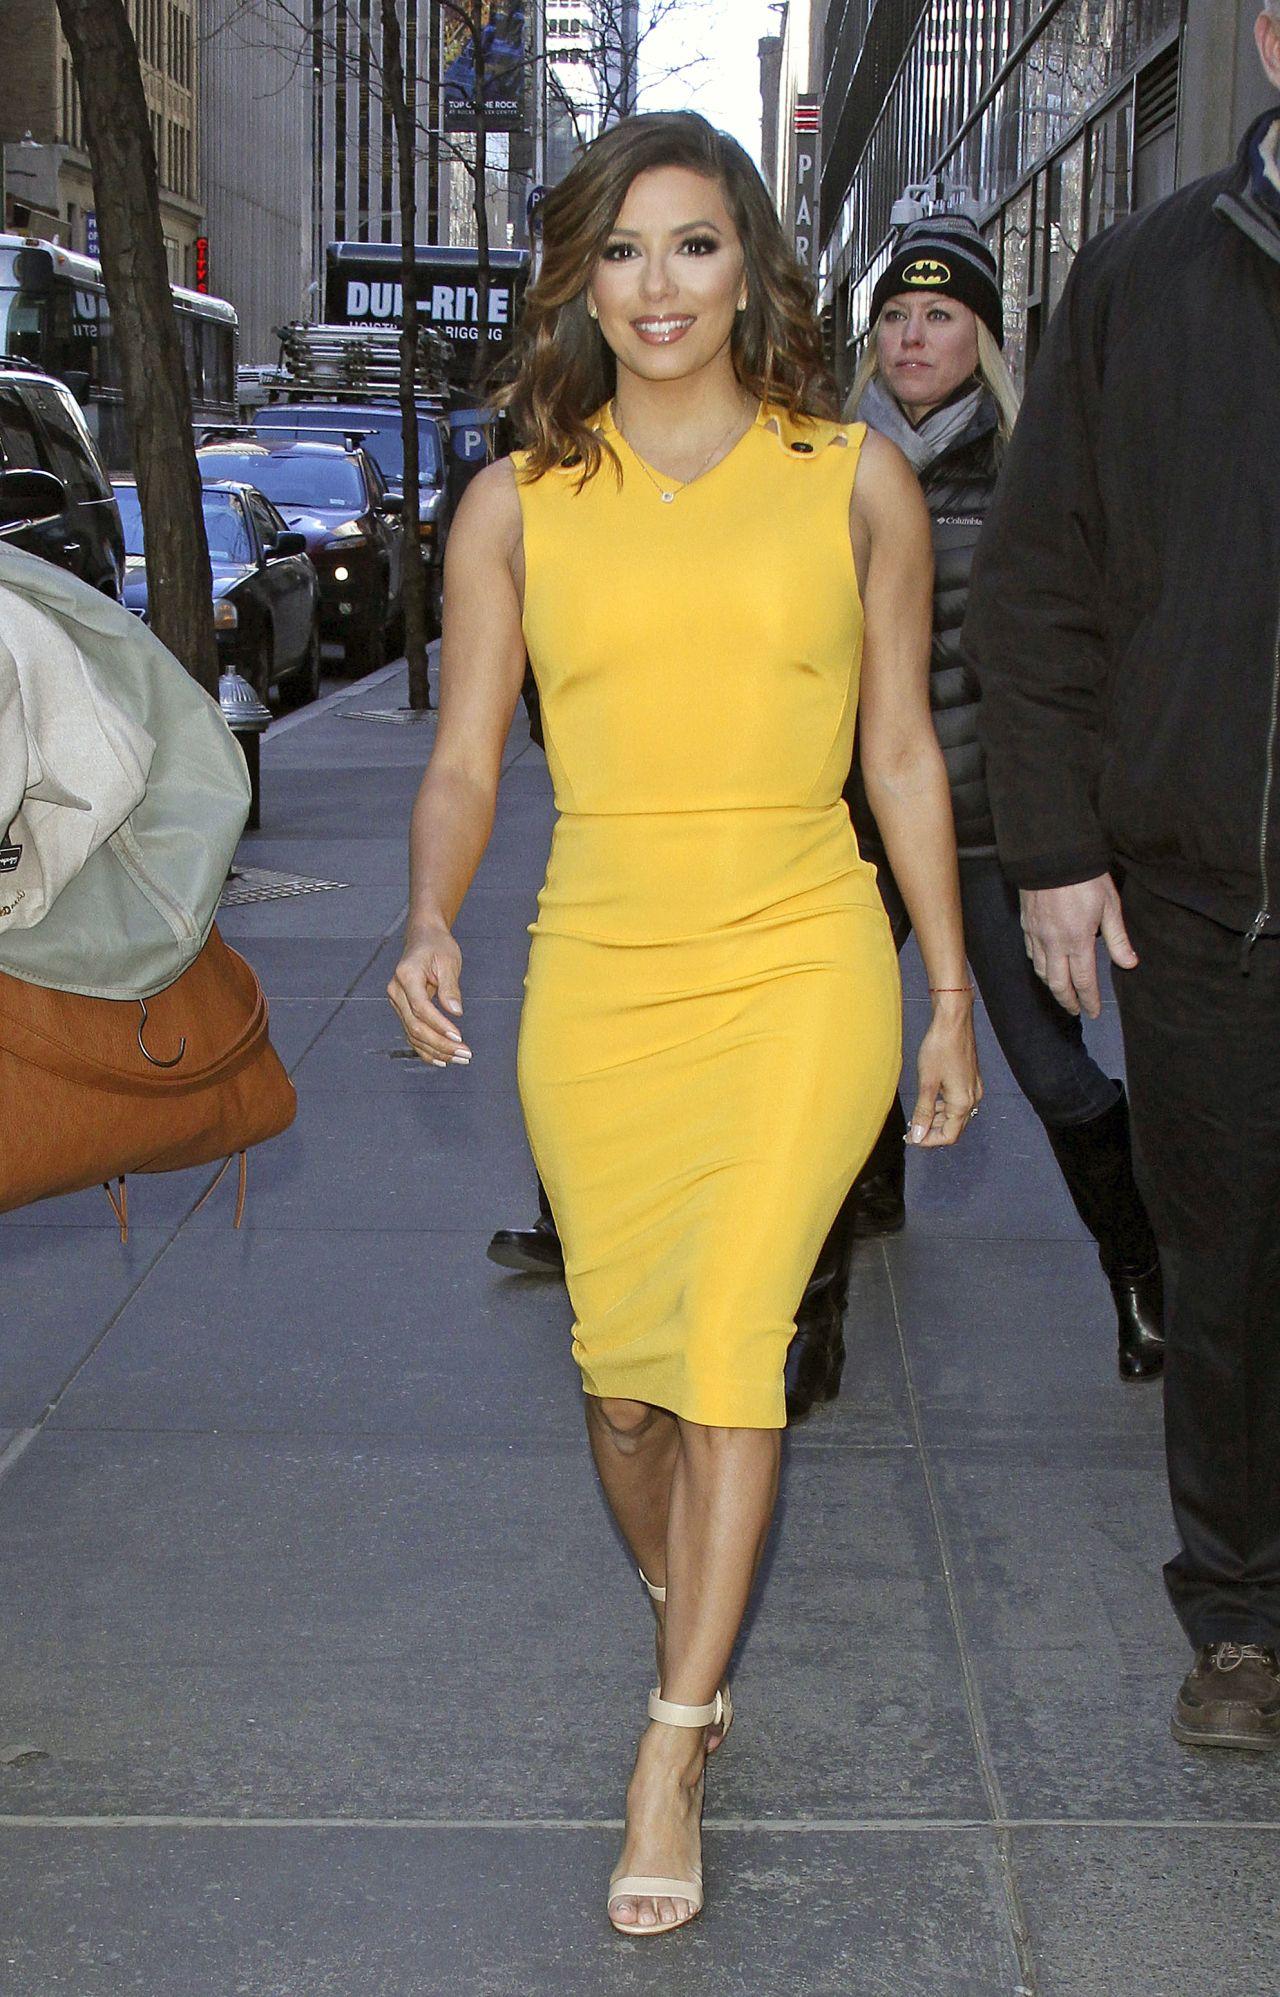 eva-longoria-in-yellow-dress-today-show-in-new-york-city-ny-2-18-2016-1